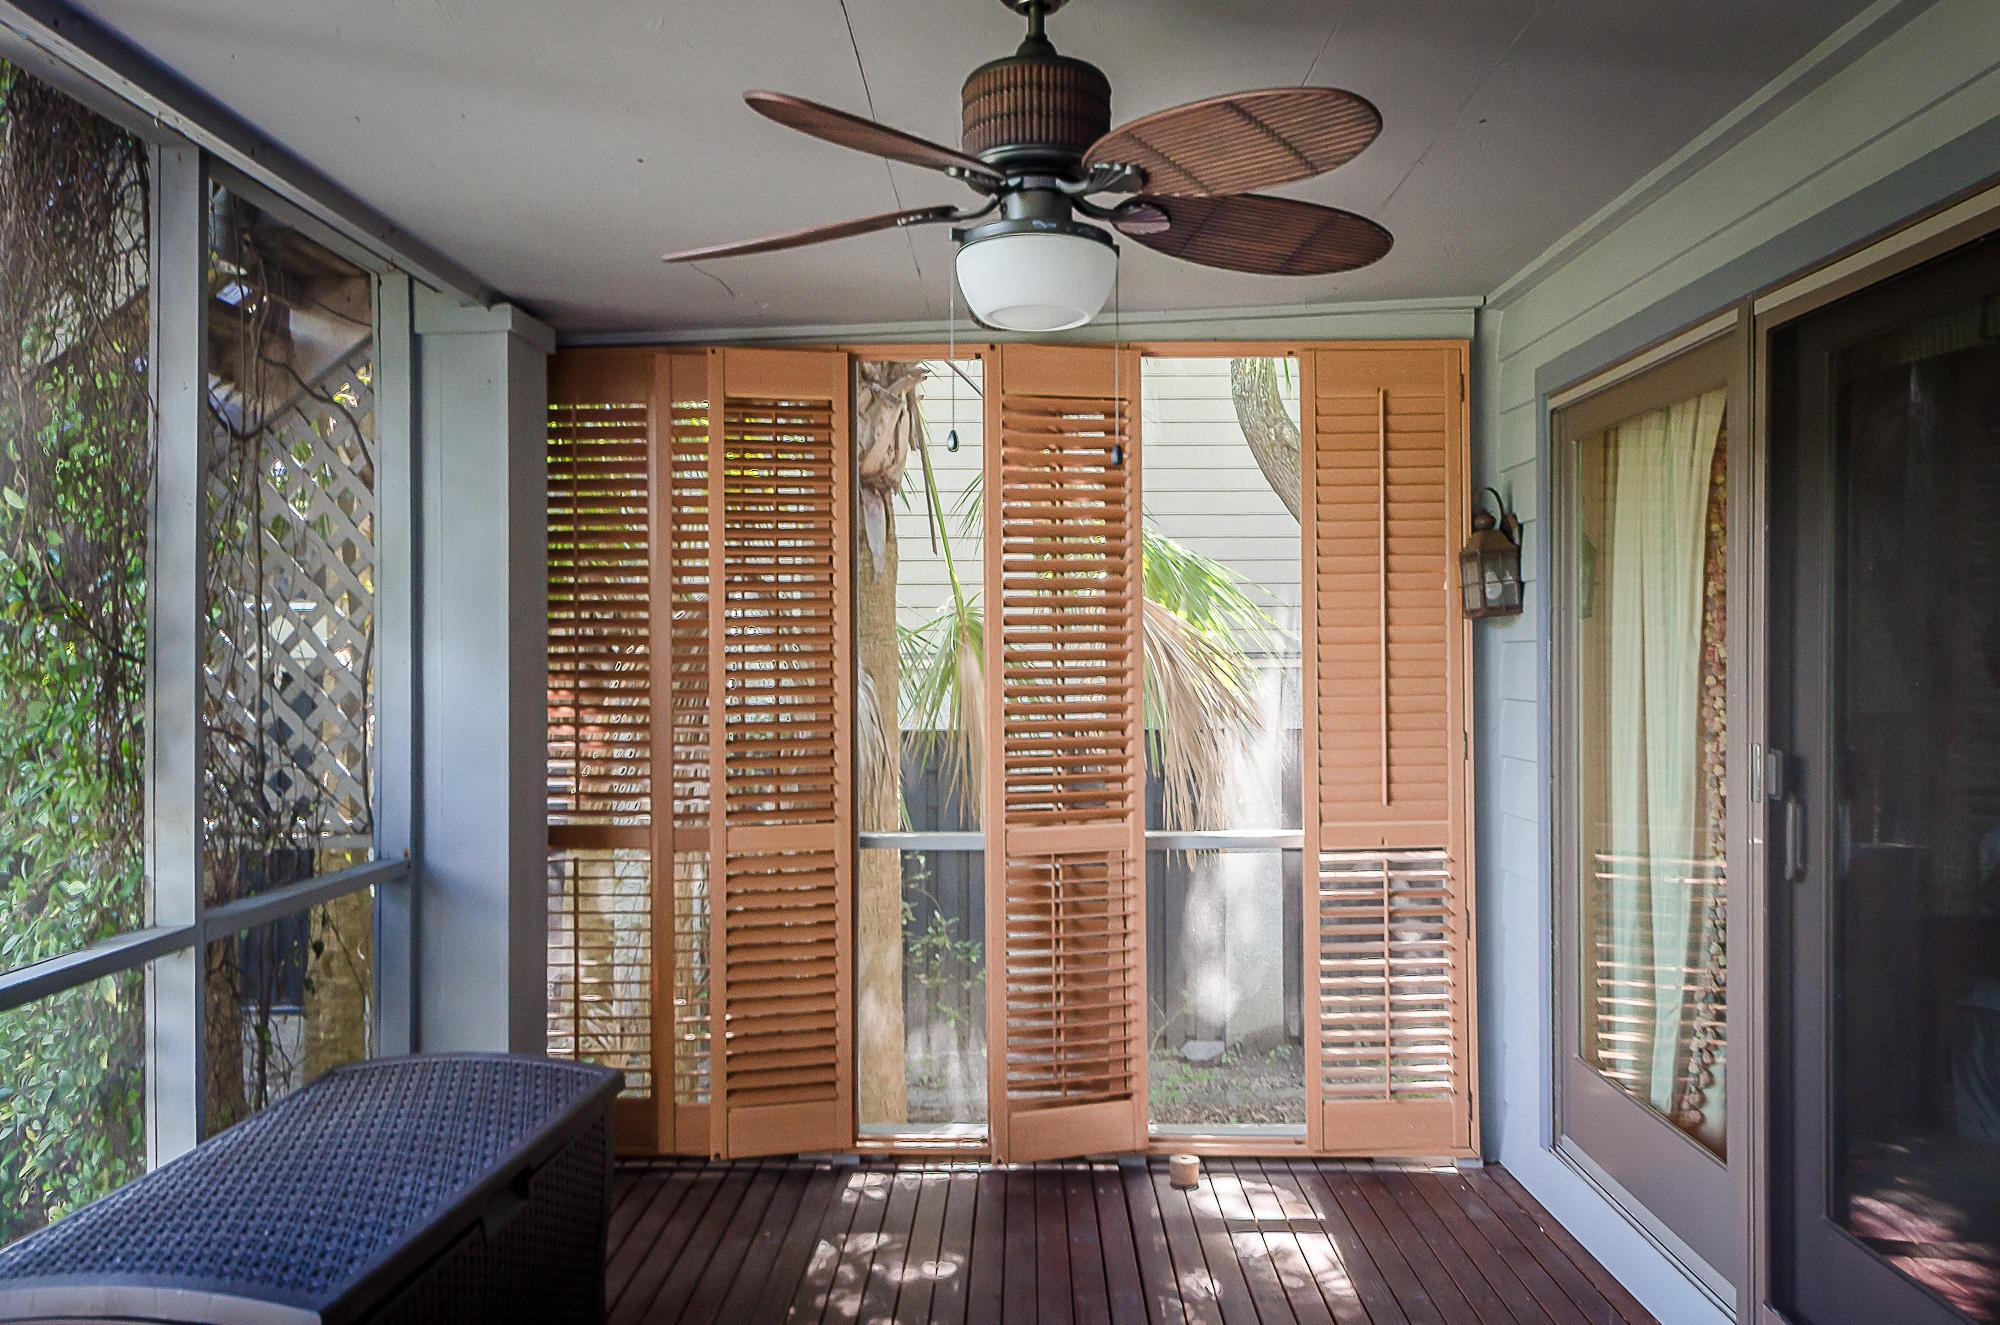 Photo of 43 Eugenia Ave, Kiawah Island, SC 29455